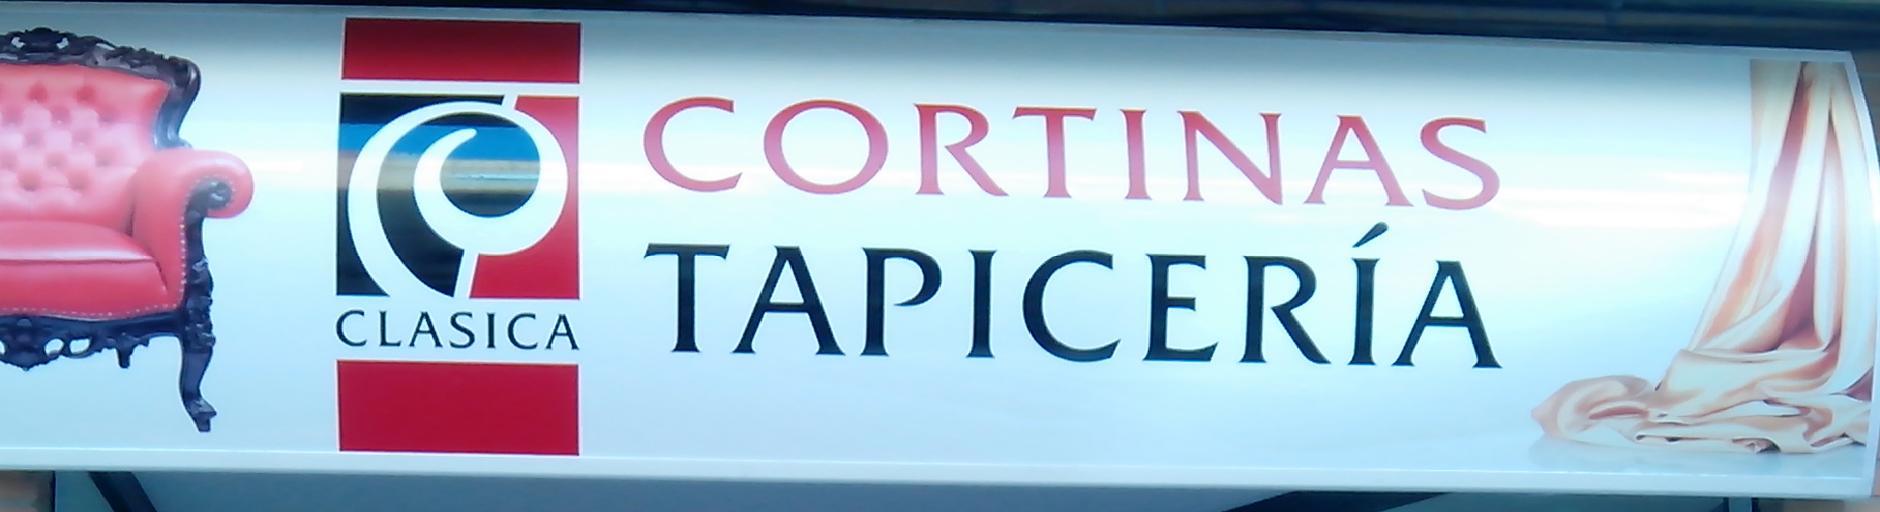 Clasica Tapiceria Y Cortinas